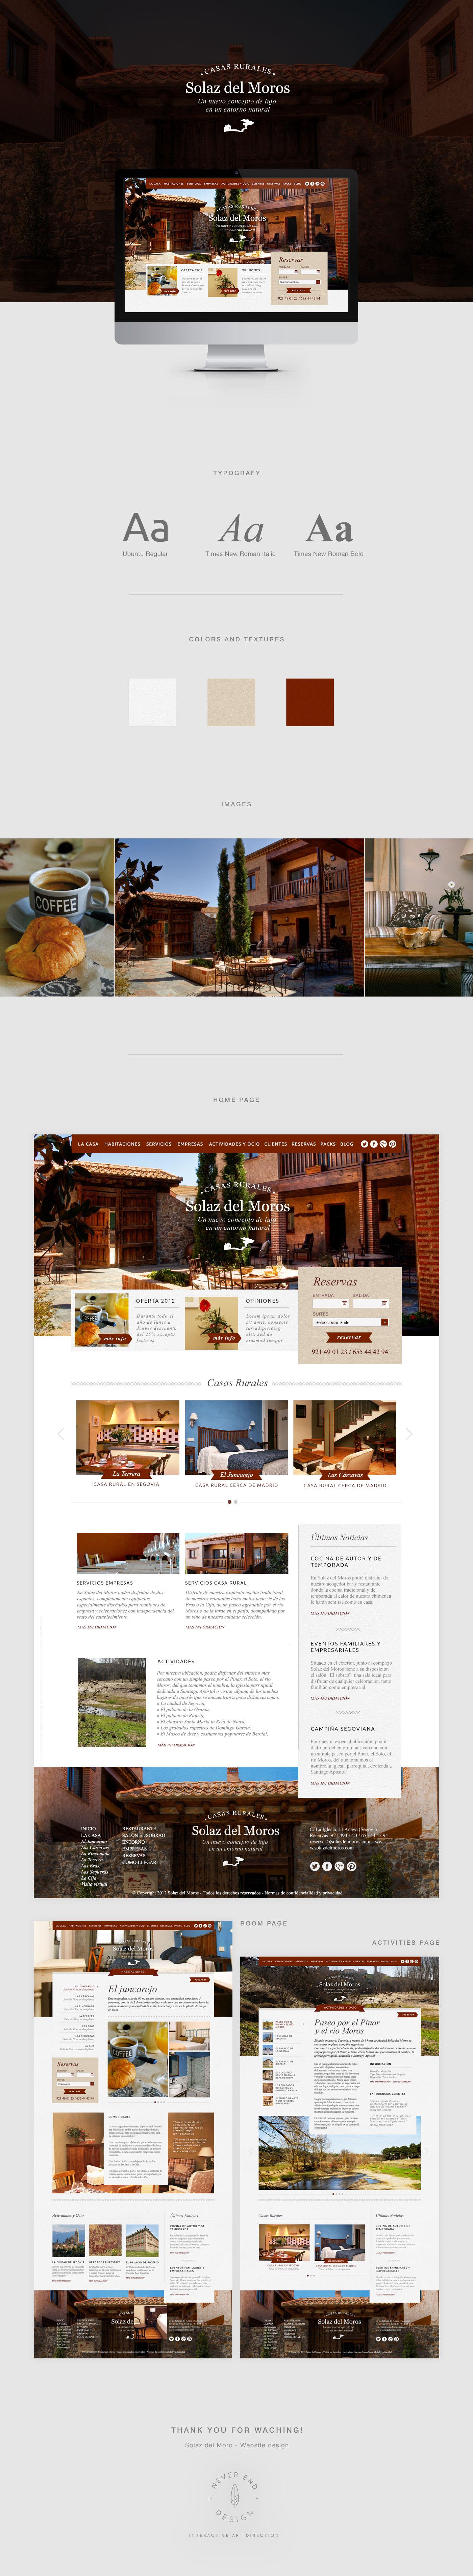 hotel,tourism,rural tourism